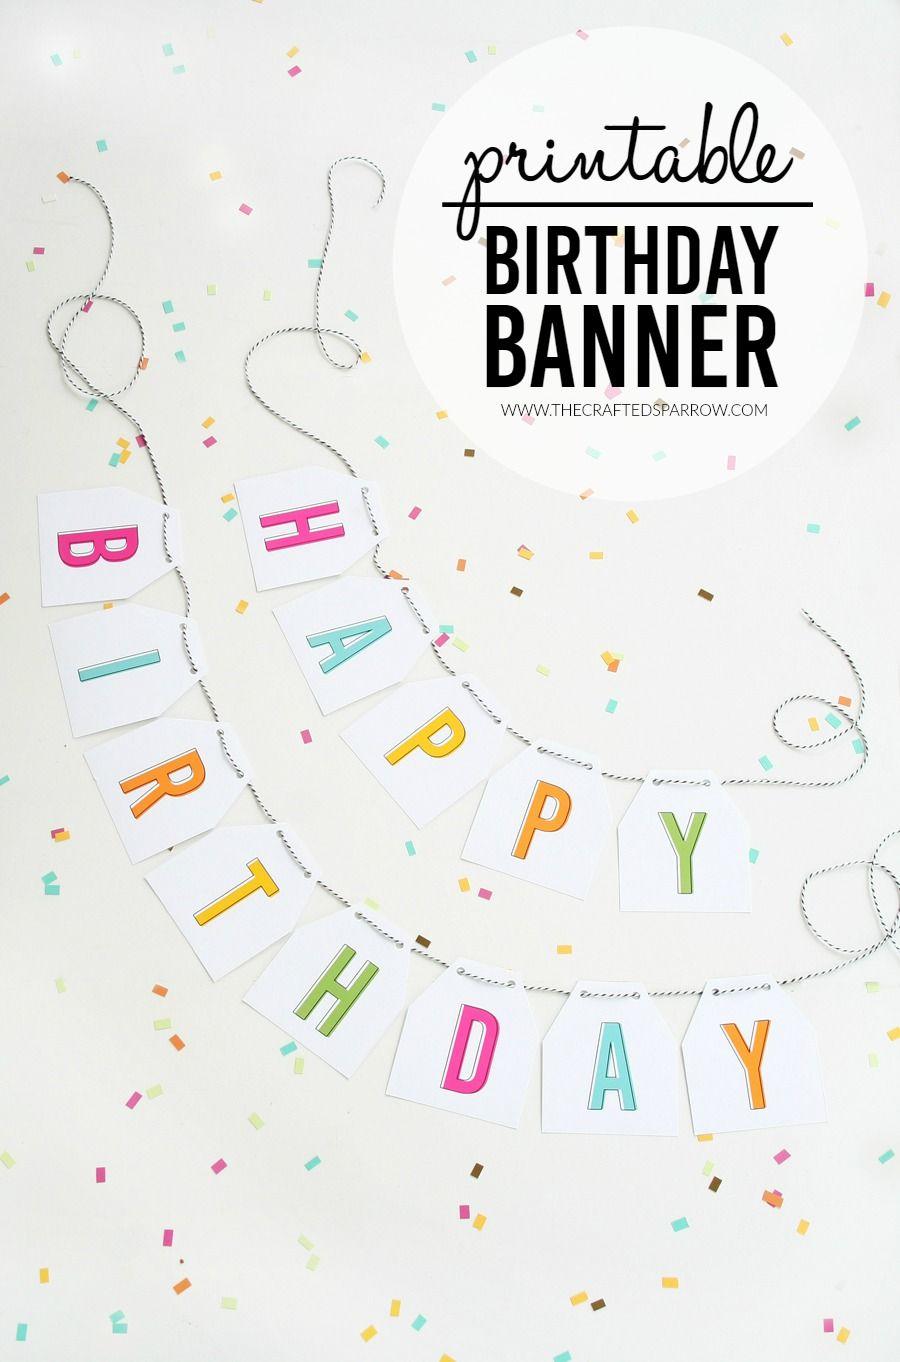 Free Printable Birthday Banner | Parties & Celebrations | Pinterest - Free Printable Birthday Banner